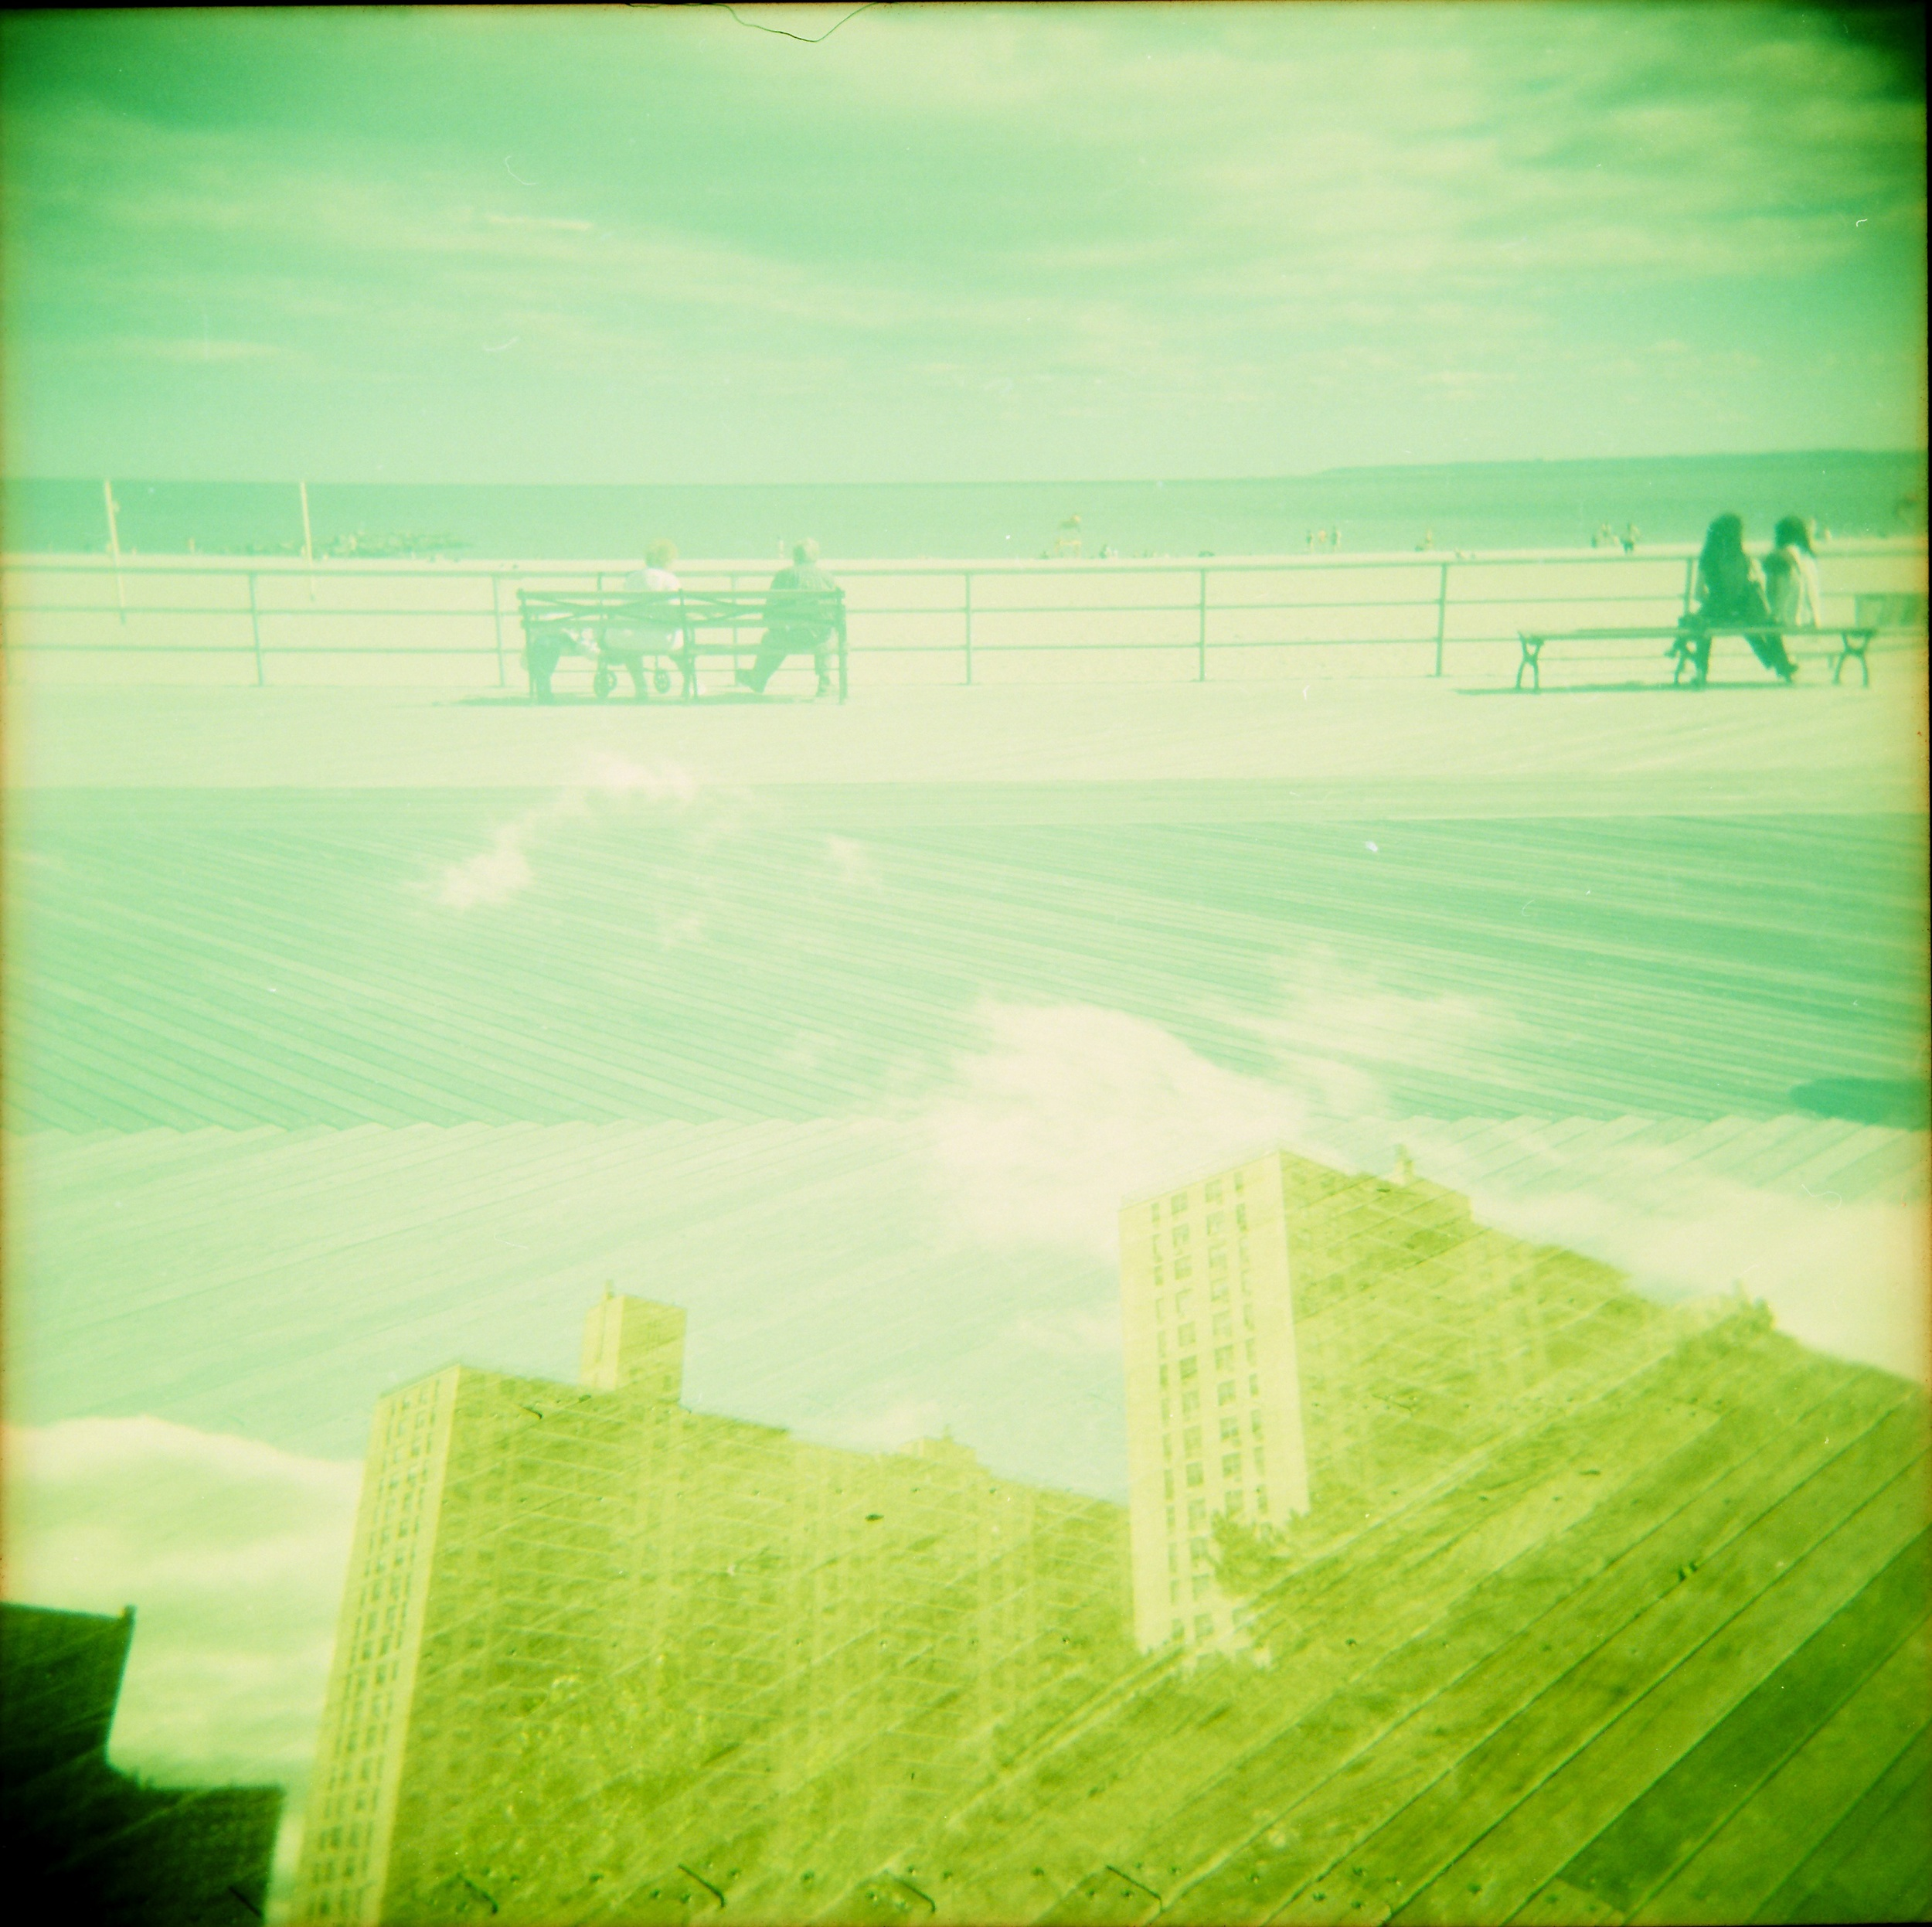 brighton beach/coney island